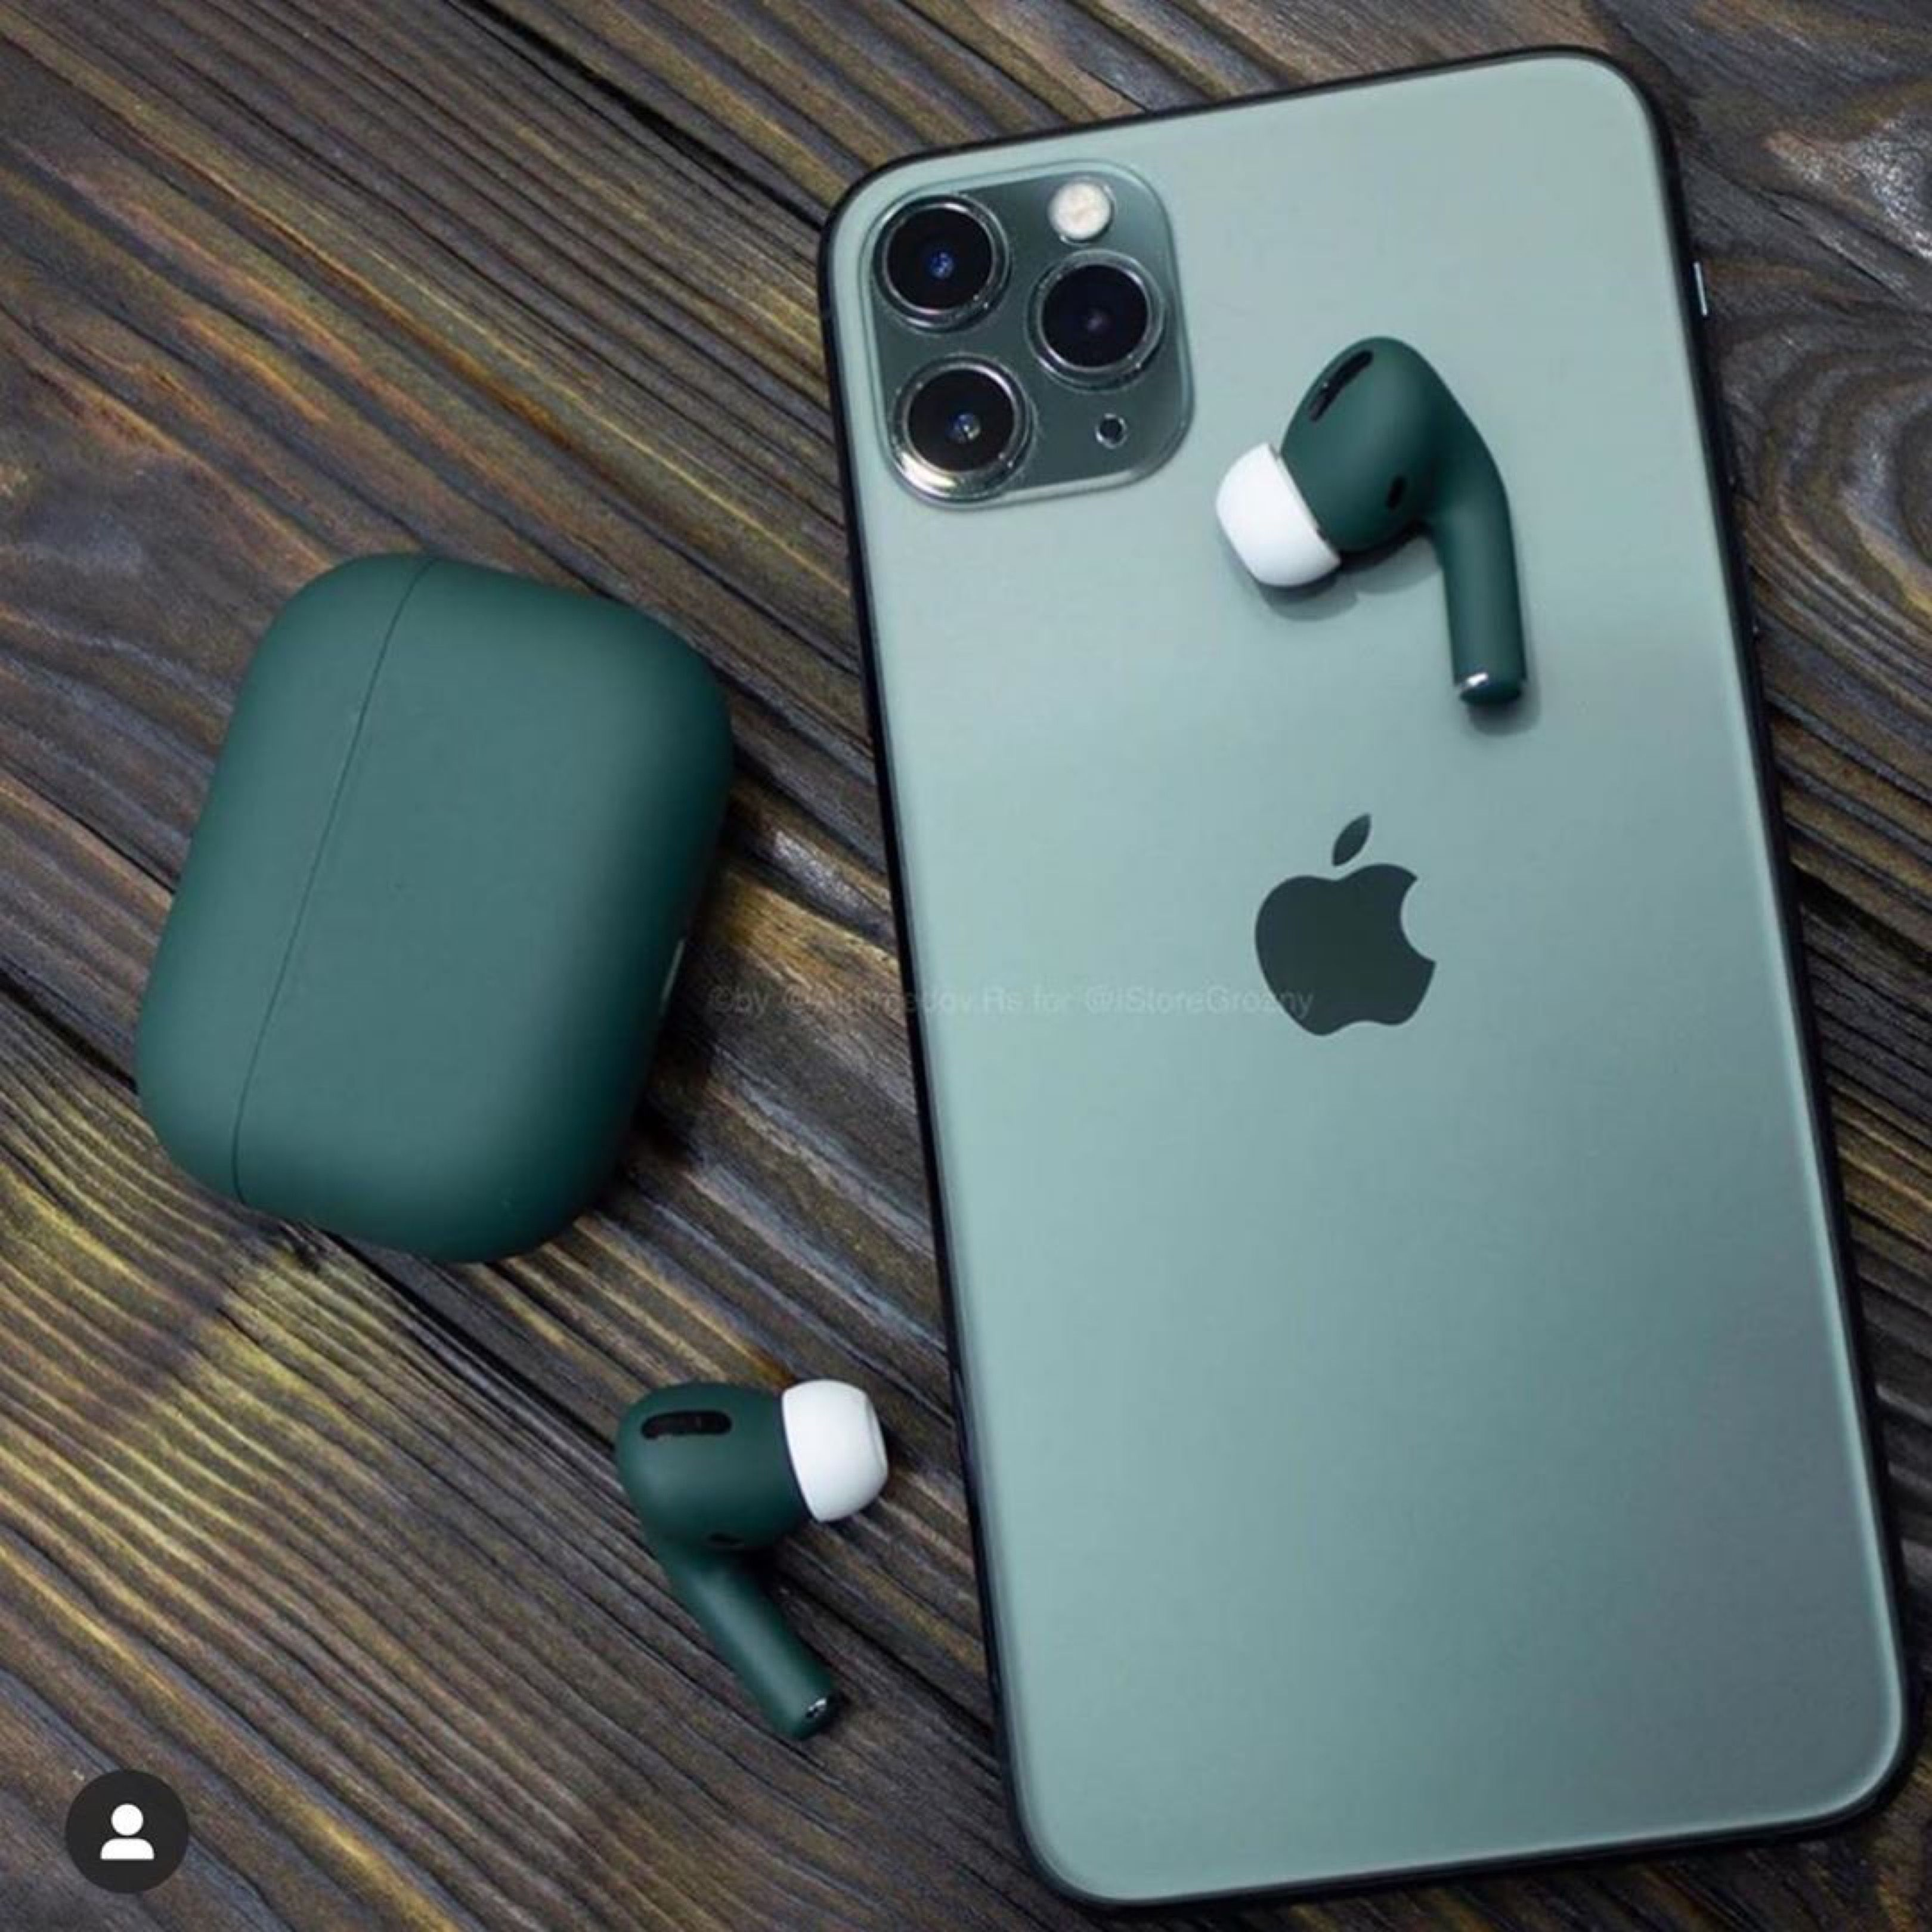 Iphone Deals Apple Gadgets Iphone Apple Smartphone Apple Iphone Accessories